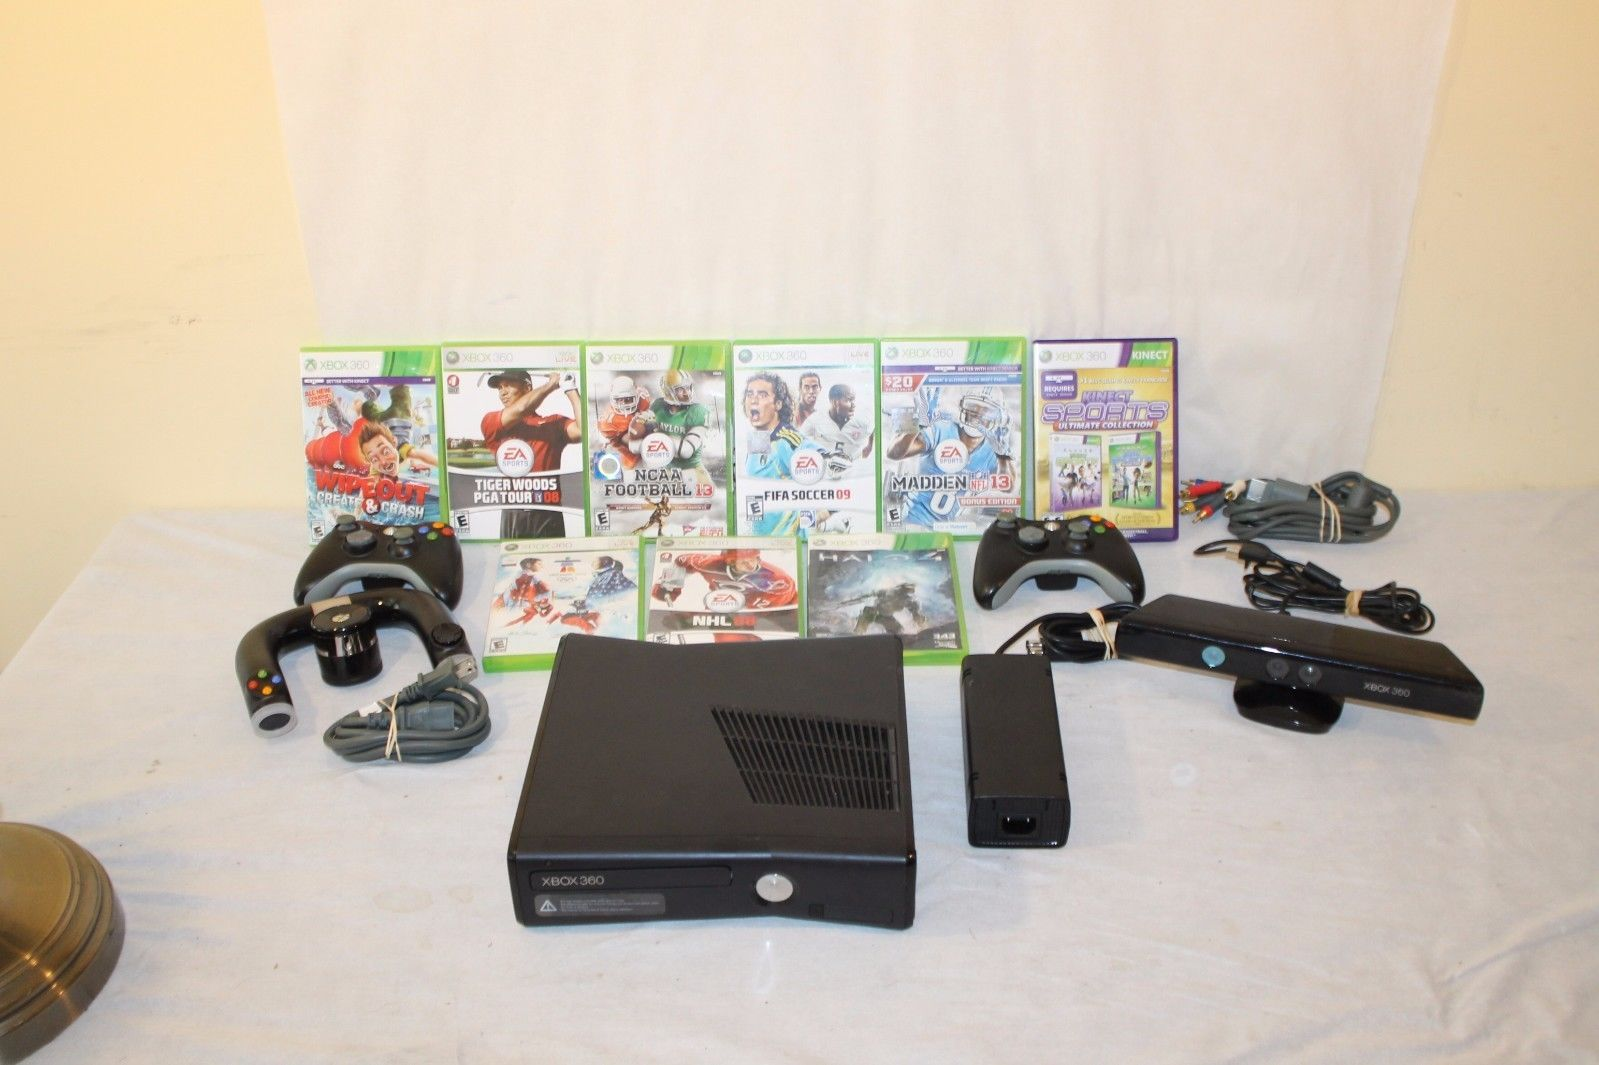 Xbox 360 Slim Matte Black Console Model 1439 10 games Kinect 3 Controllers https://t.co/km8jeJvJS4 https://t.co/YBM90XcLoK